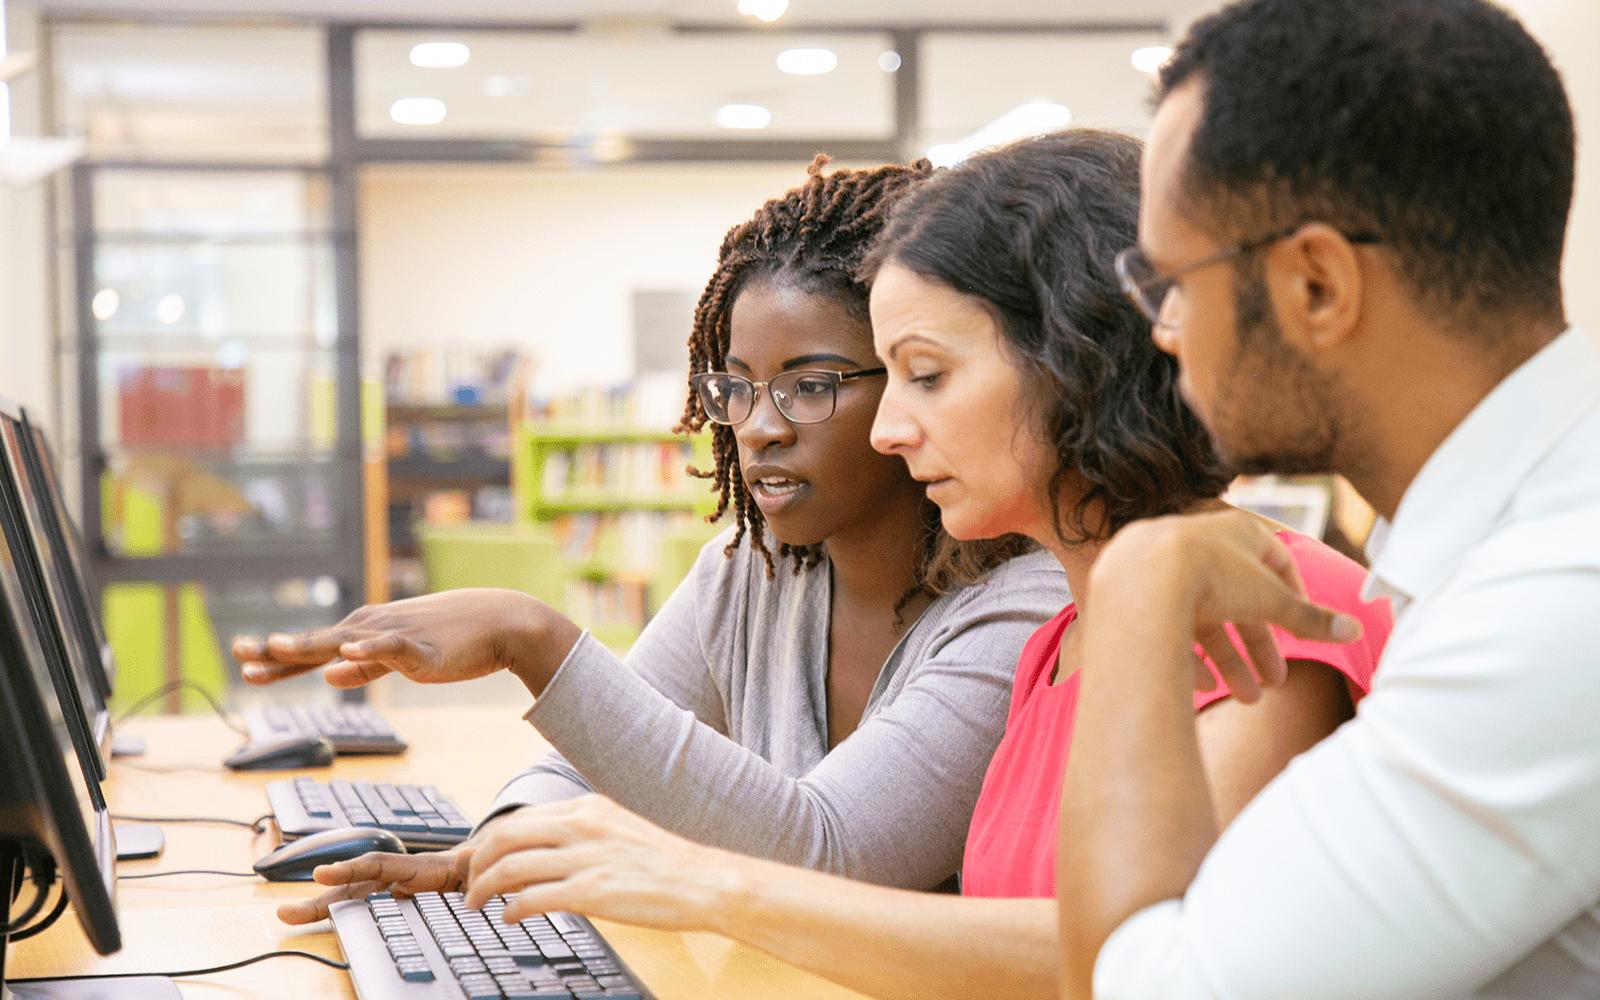 Professionals around a computer